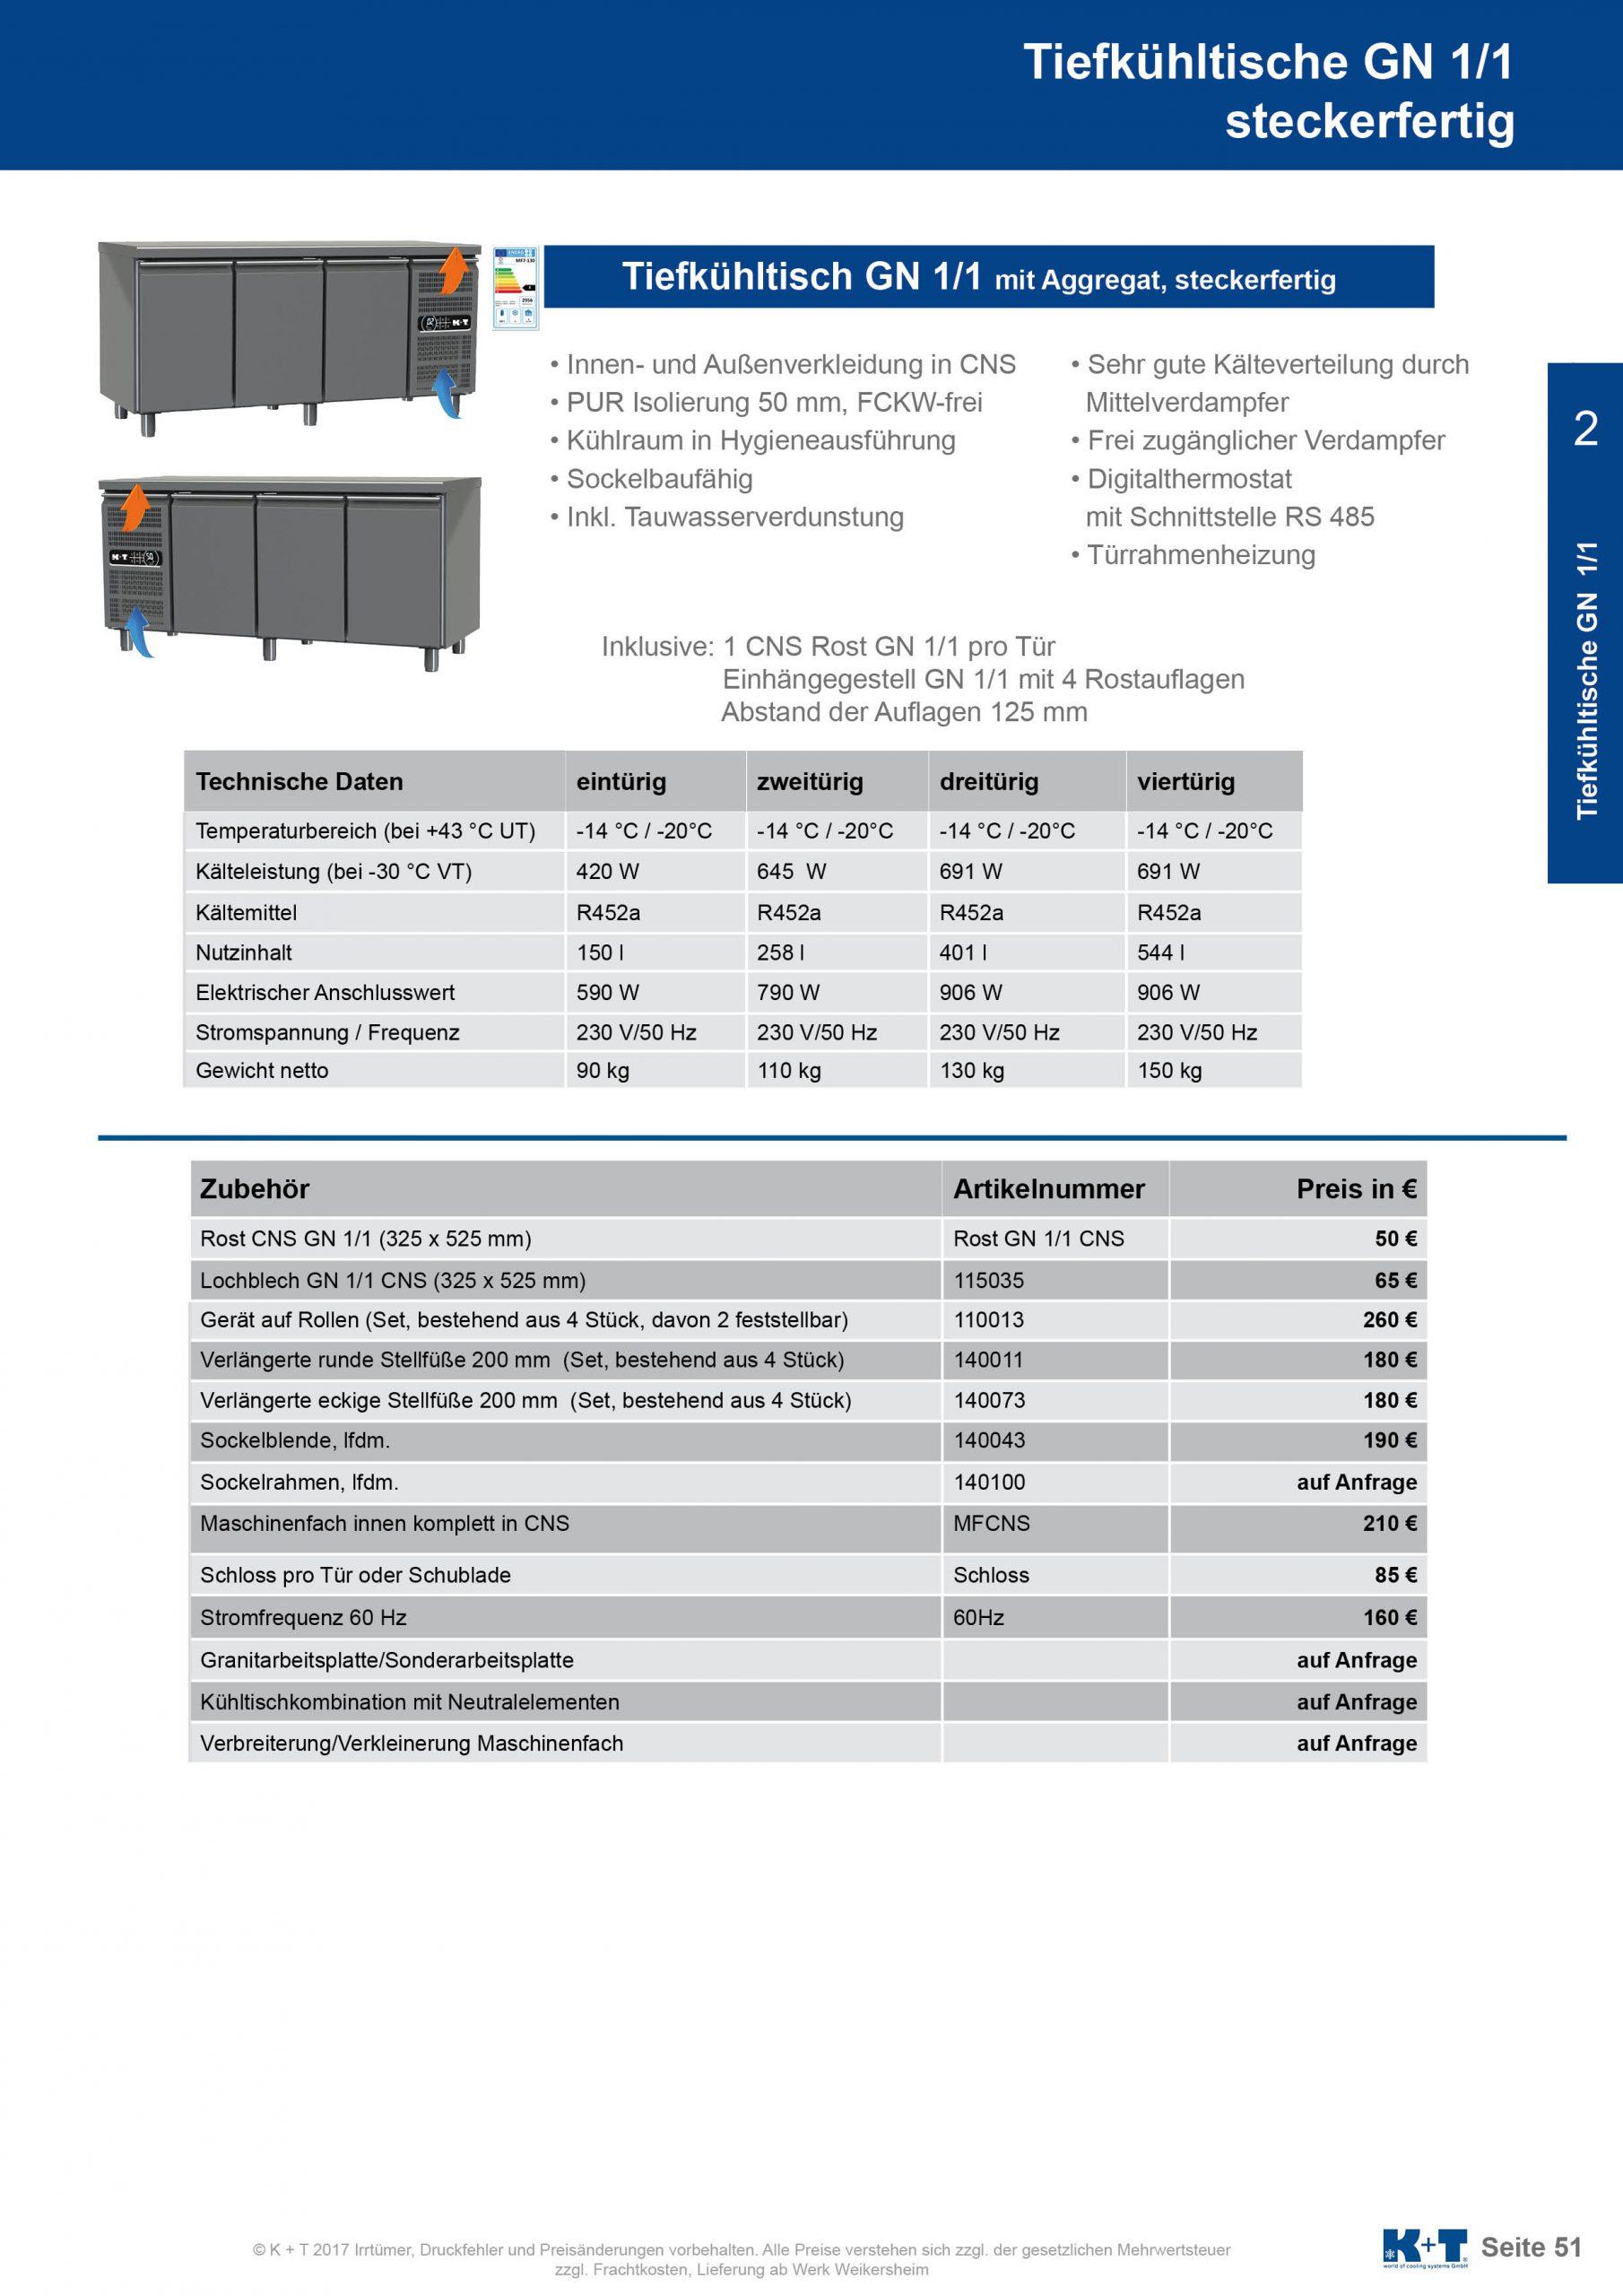 Tiefkühltisch GN 1_1 Korpus 650 steckerfertig 2